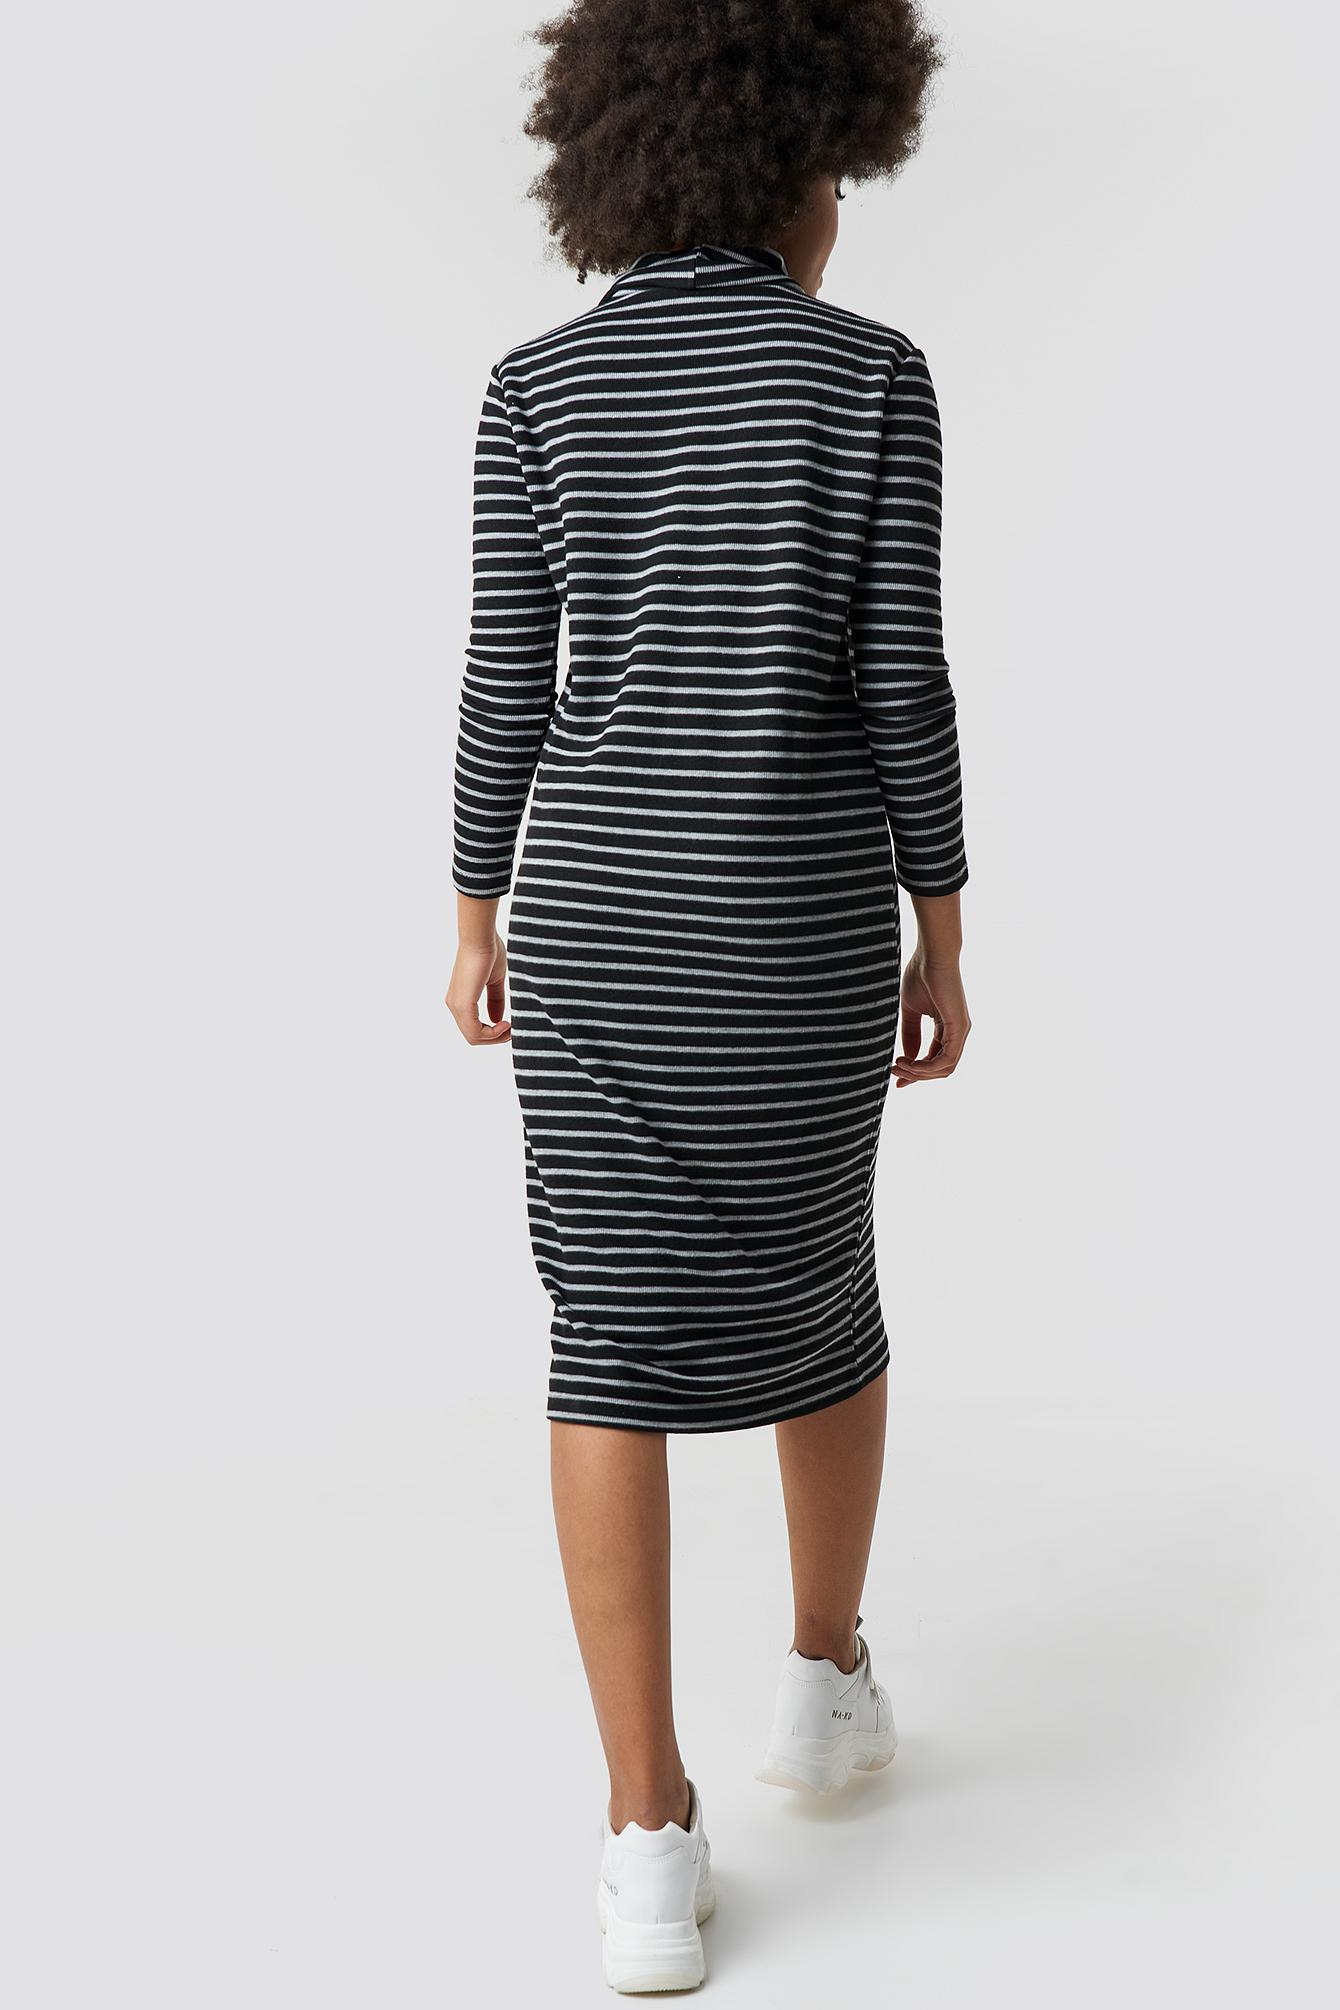 72af08c4817 Trendyol - Striped Knitted Midi Dress Black - Lyst. View fullscreen